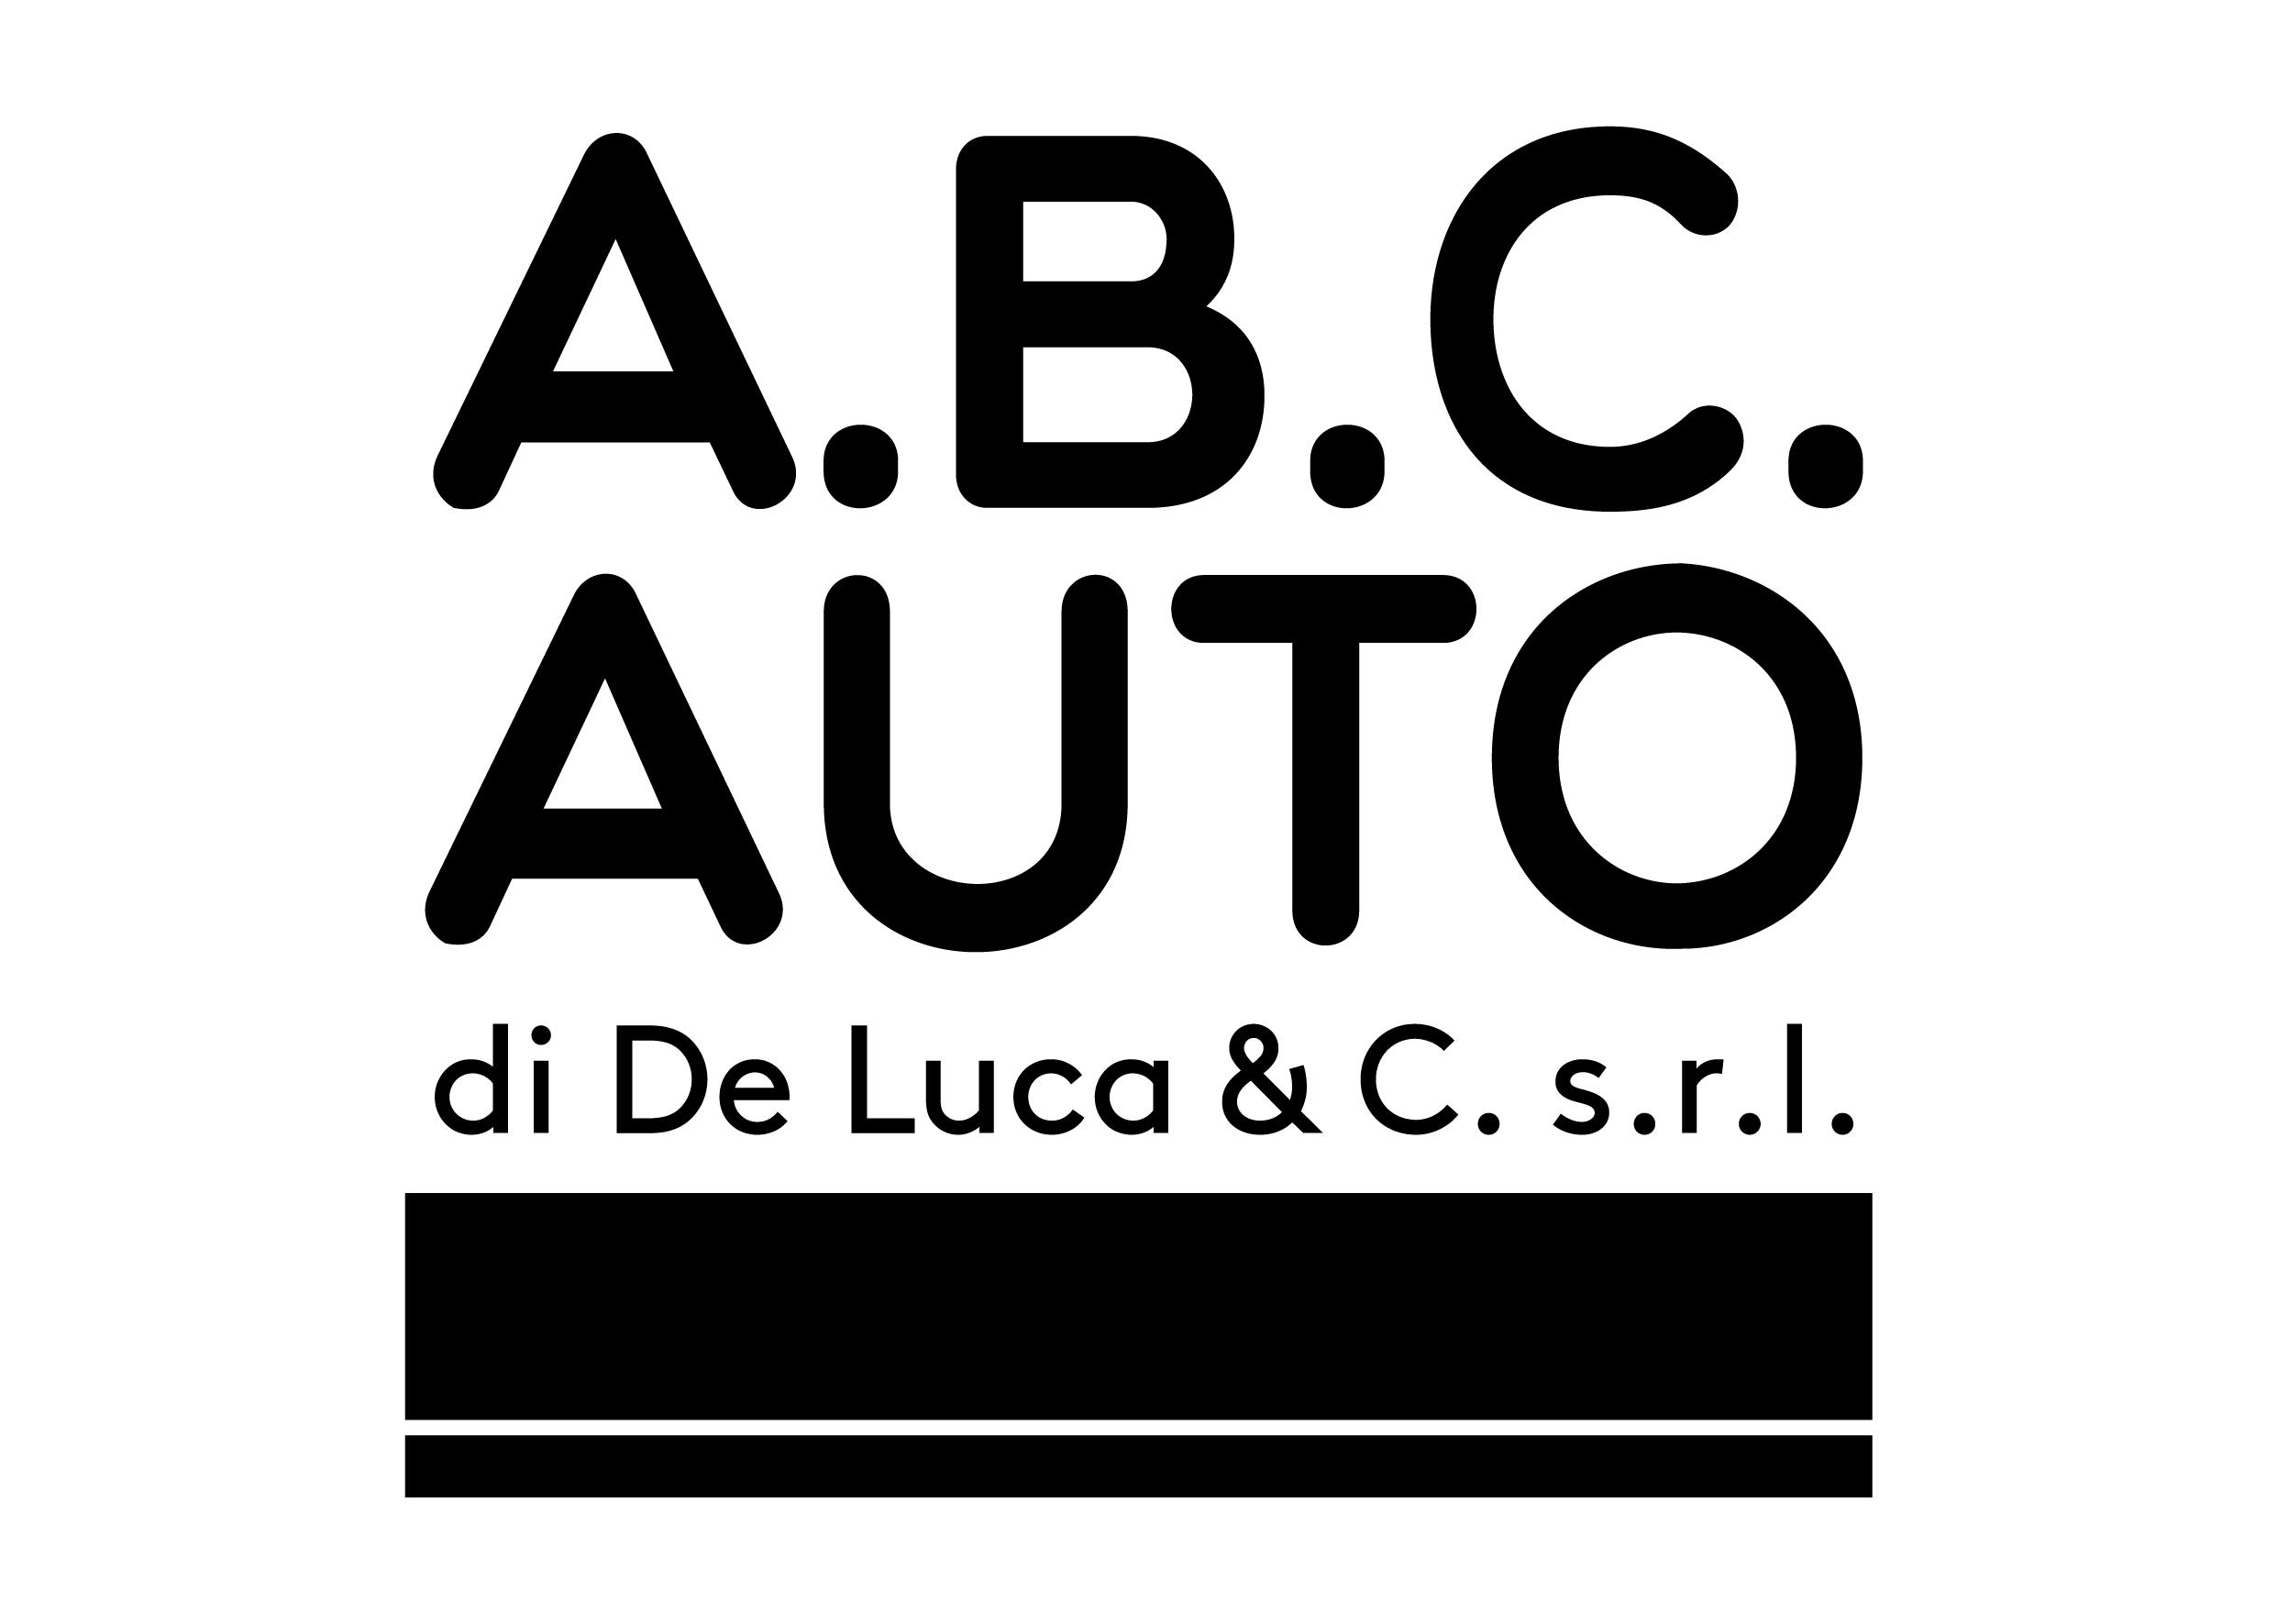 ABC Auto - Sponsor - Reload Soundfestival